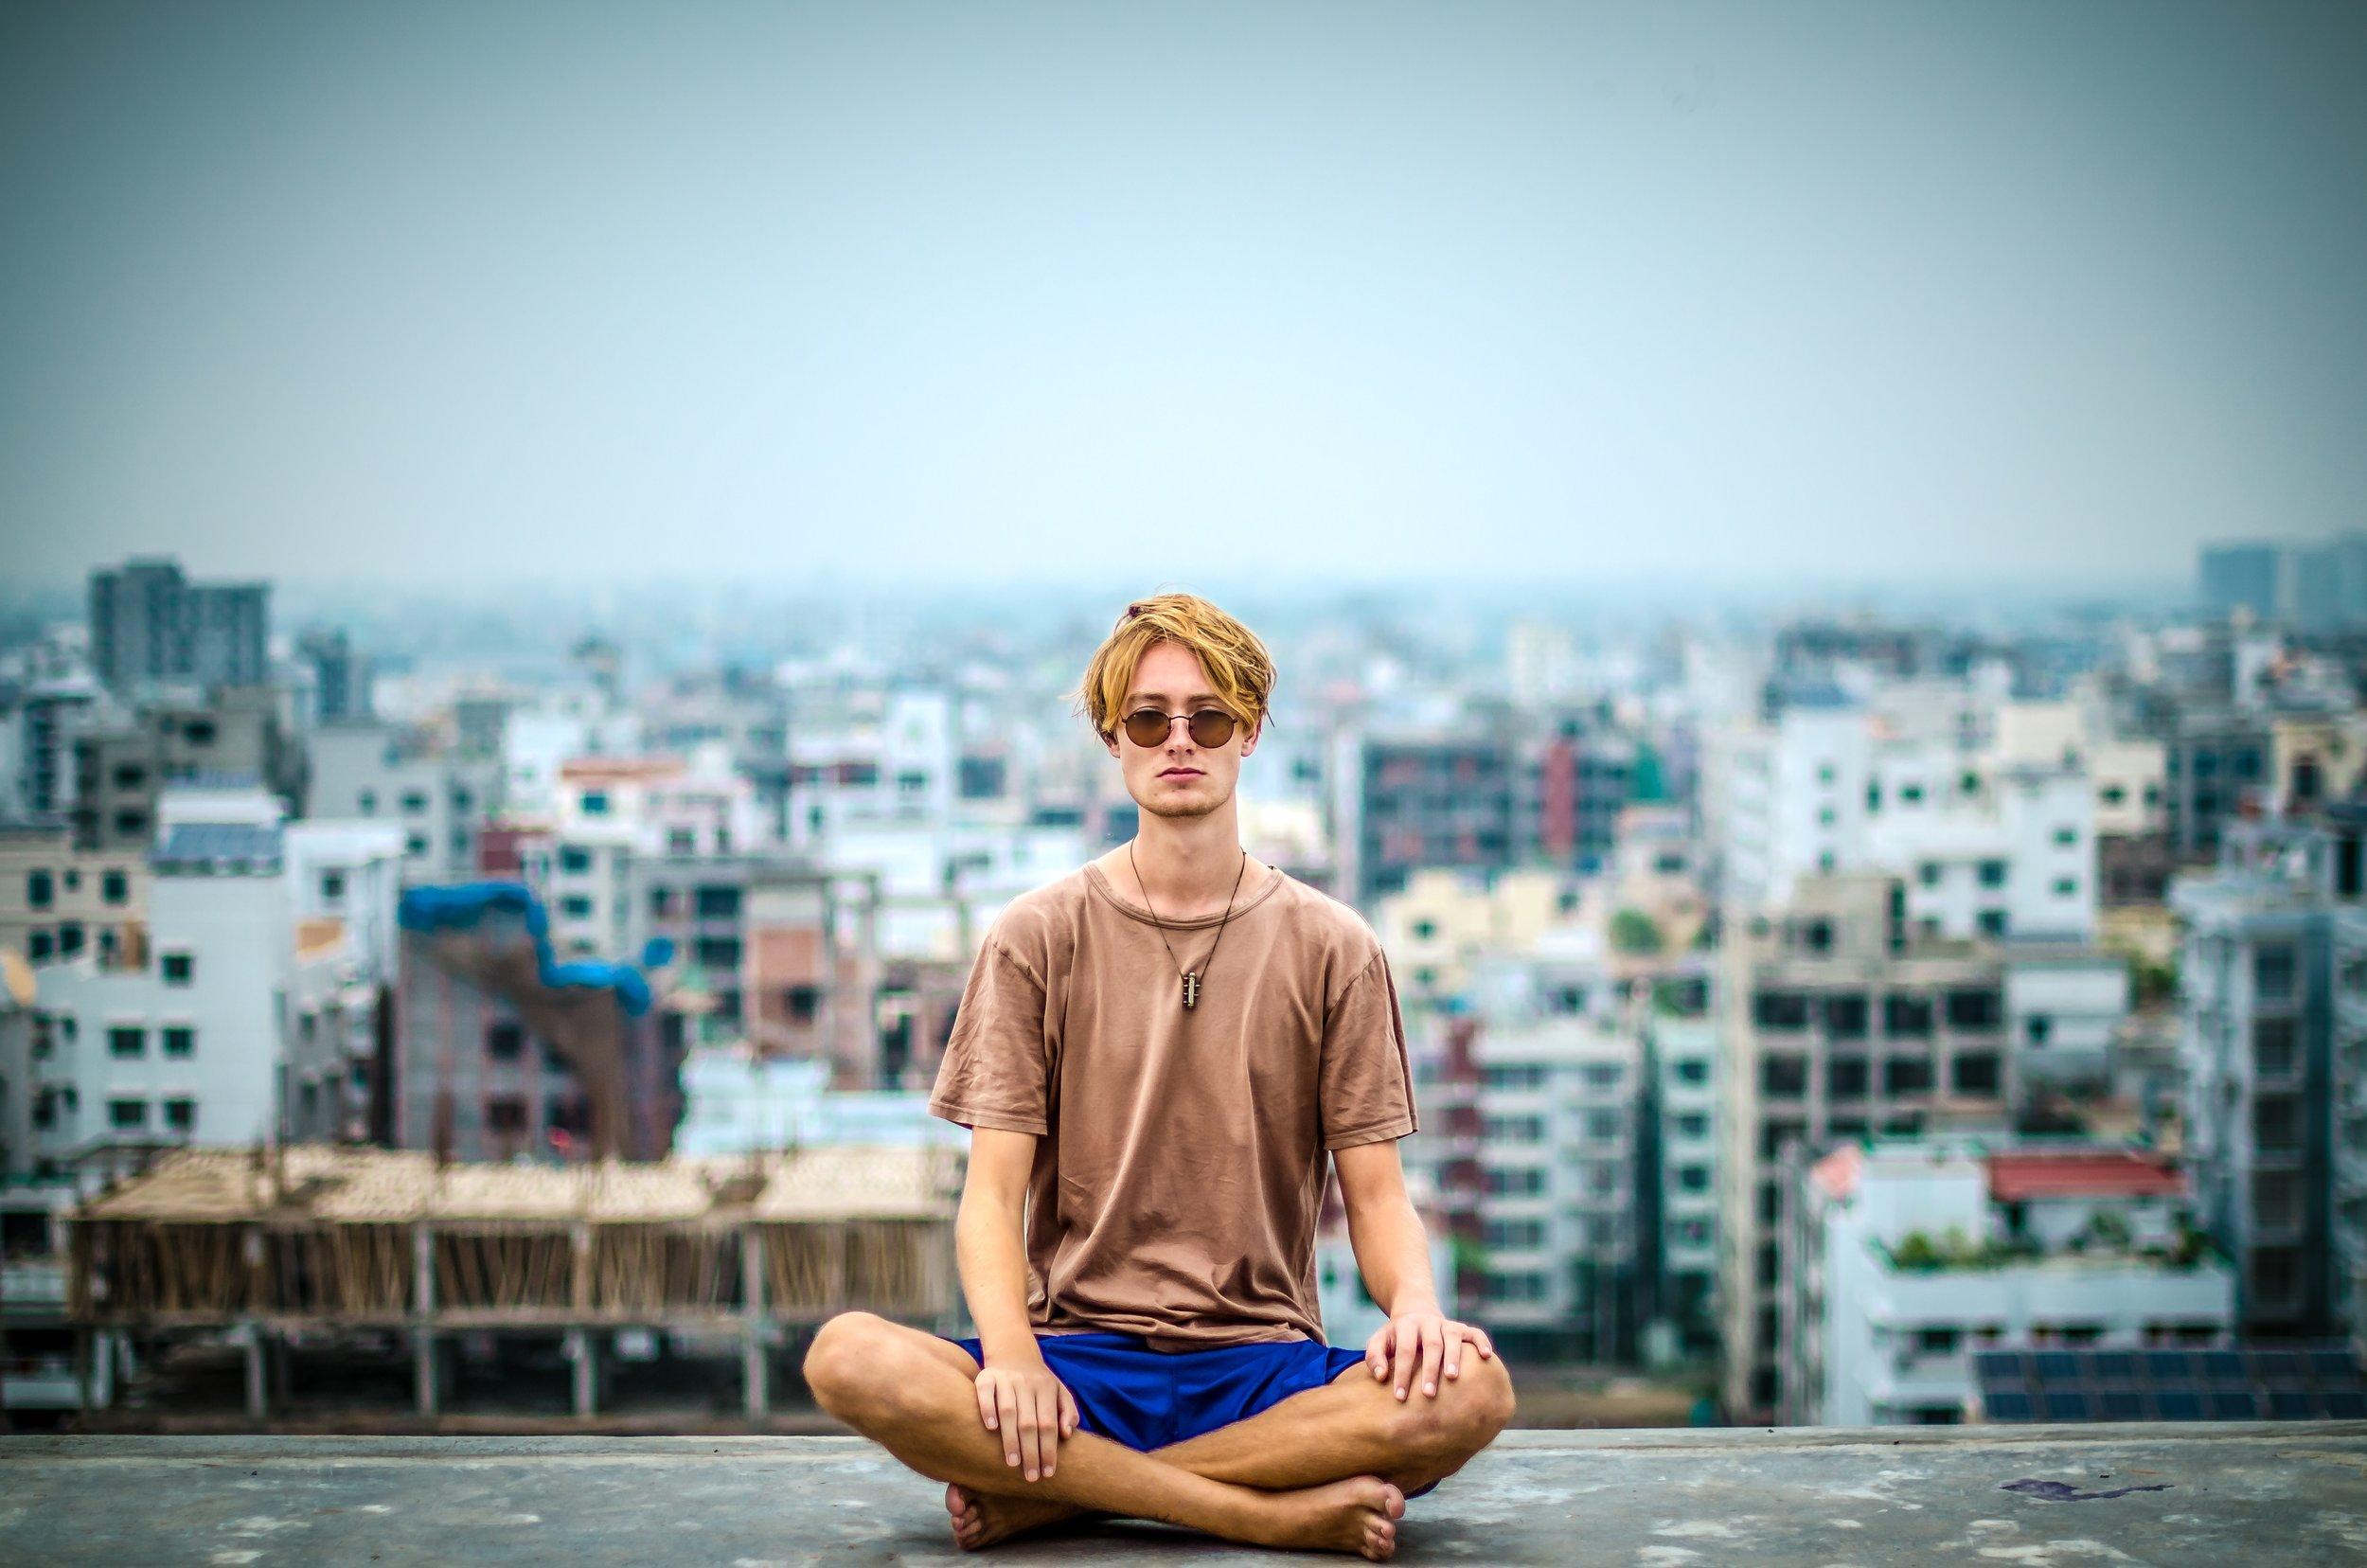 Meditation helps manage stress